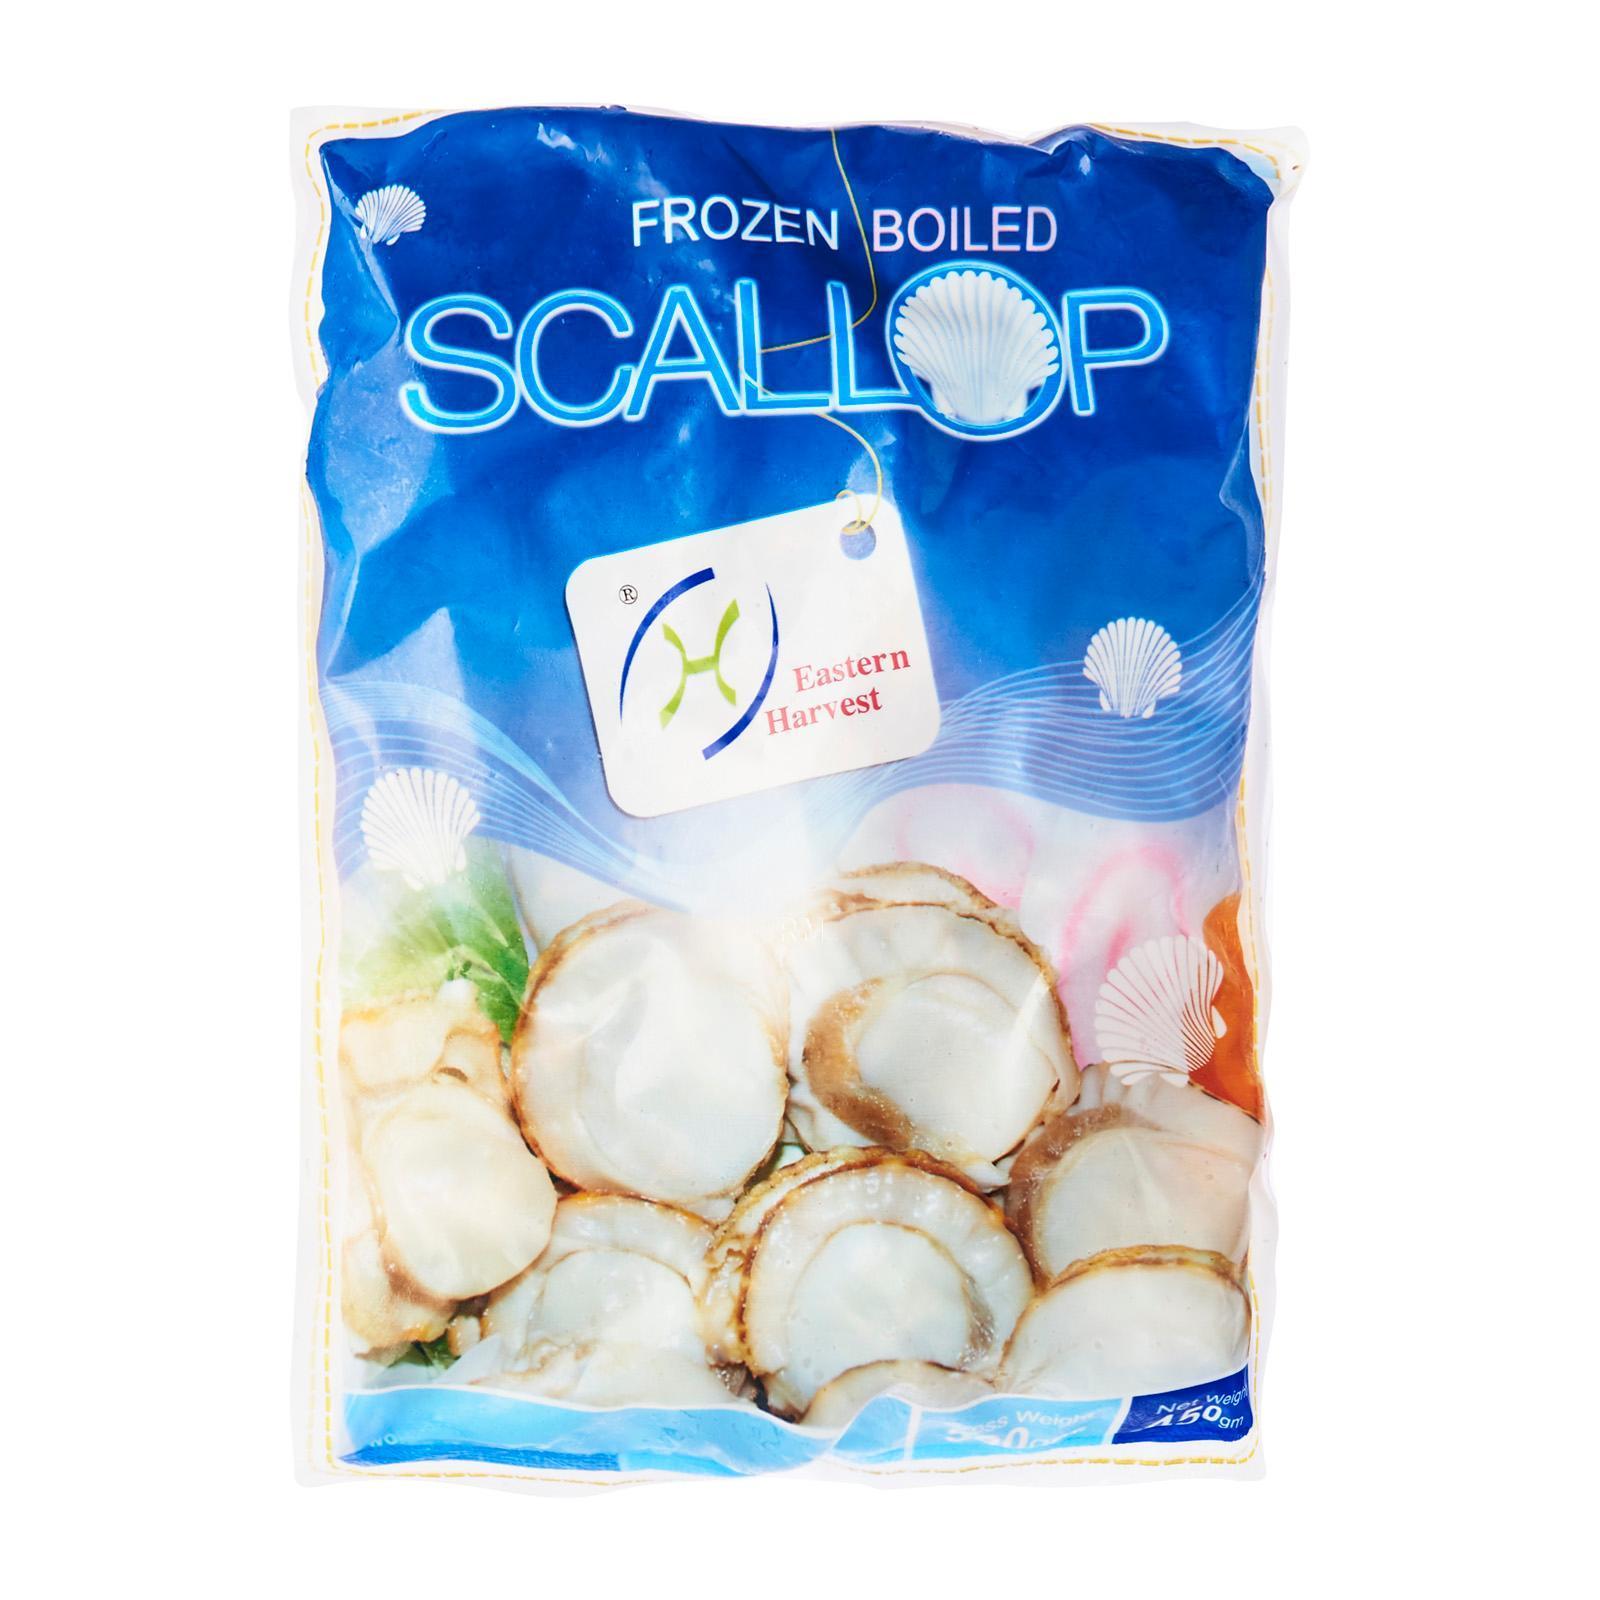 Ehf Boiled Scallop - Frozen